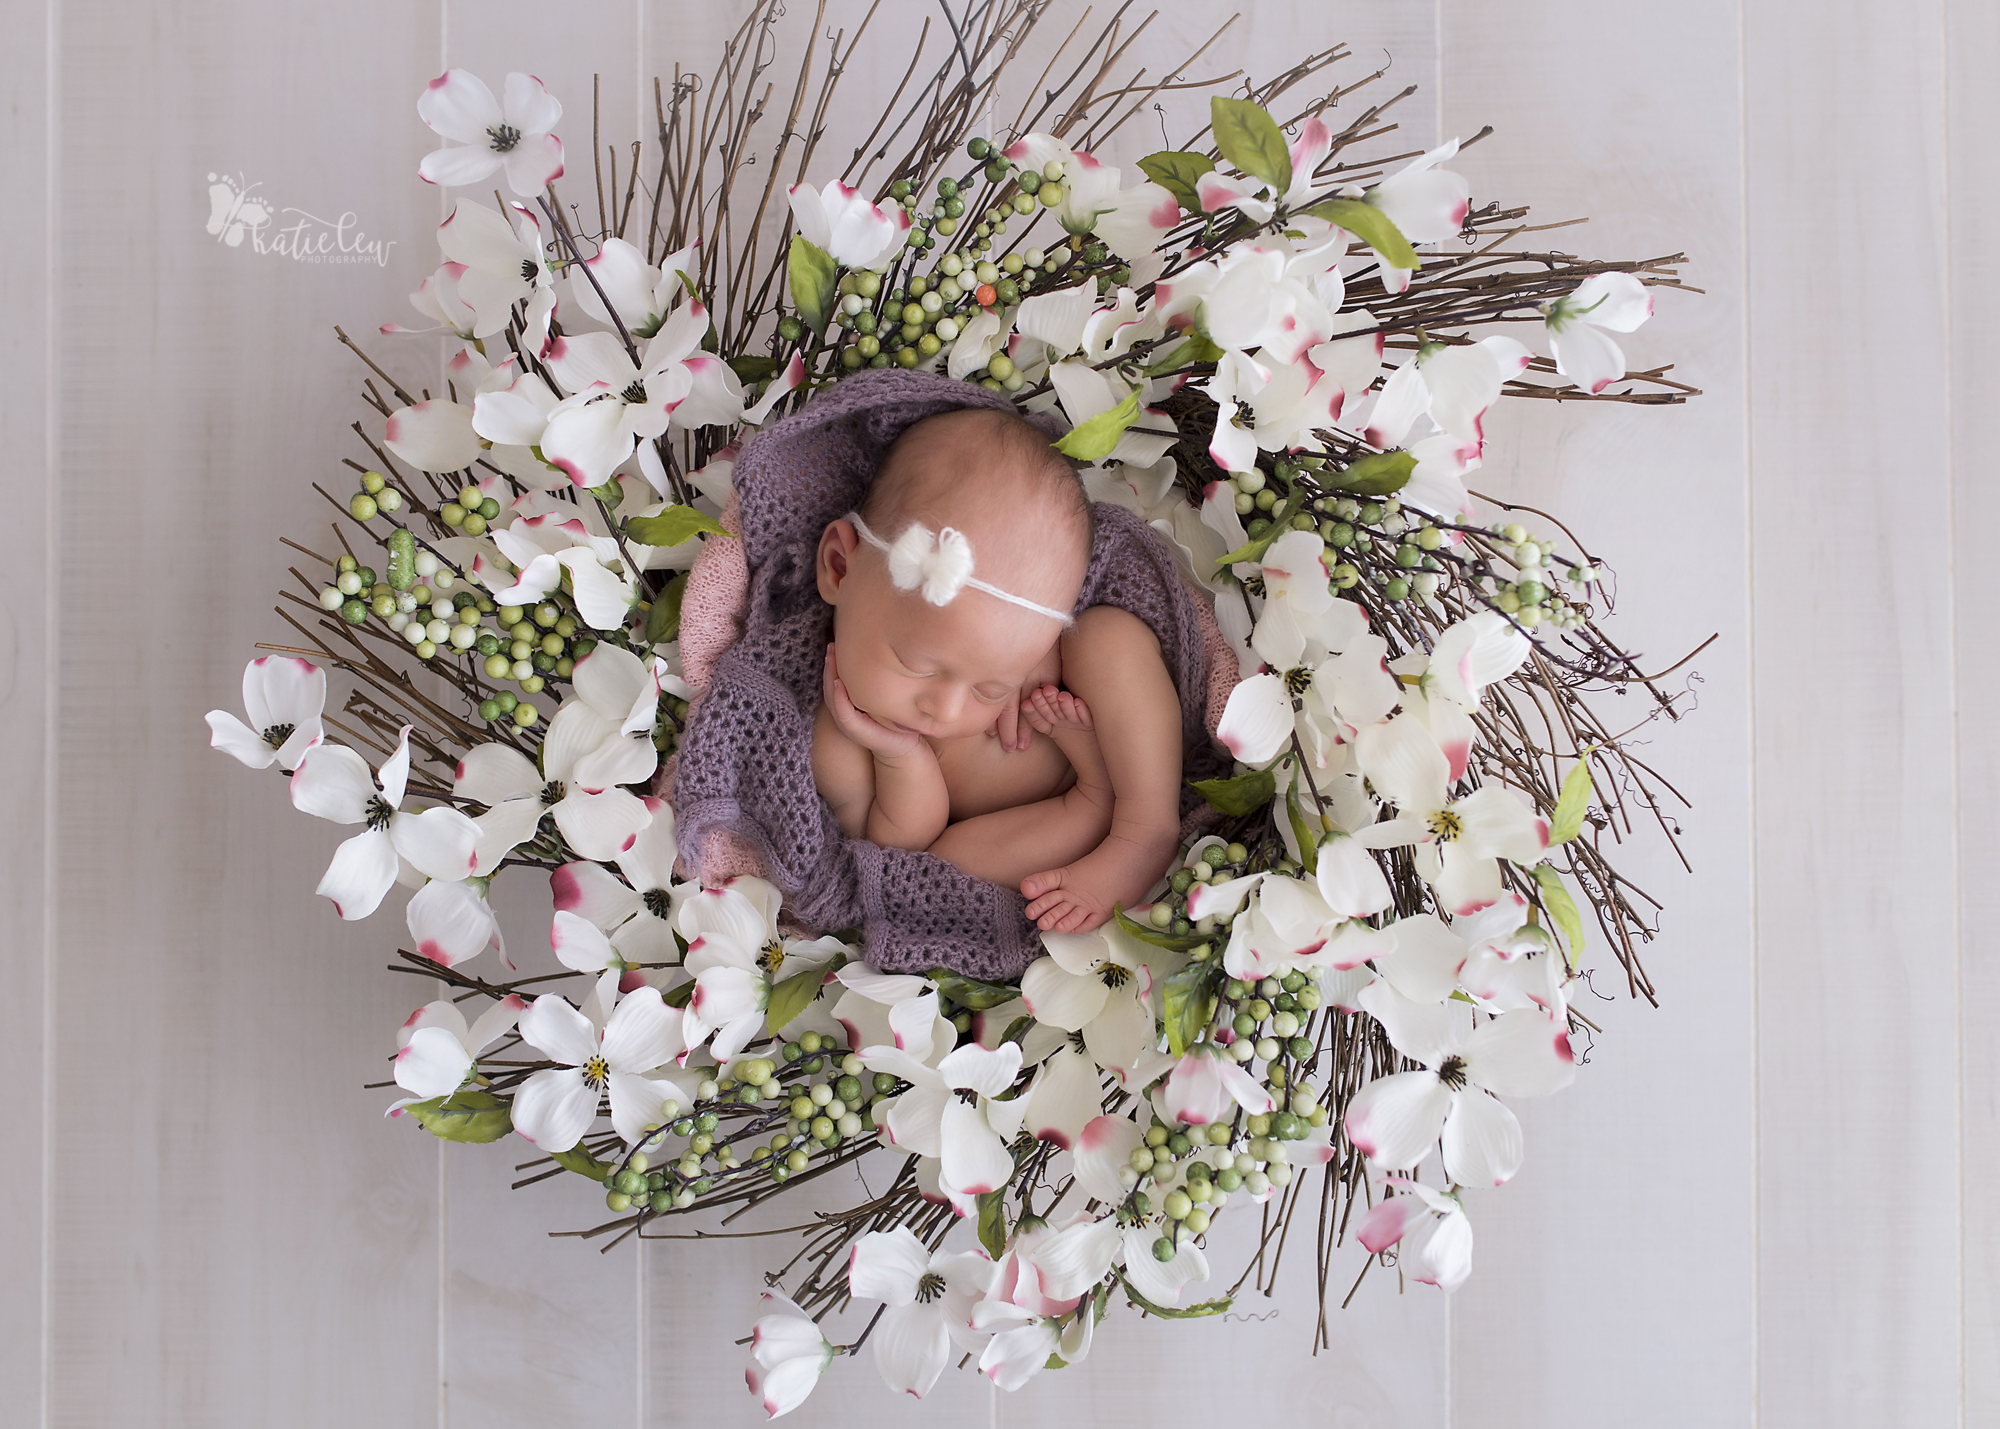 Newborn Regular$425 - Click for more details